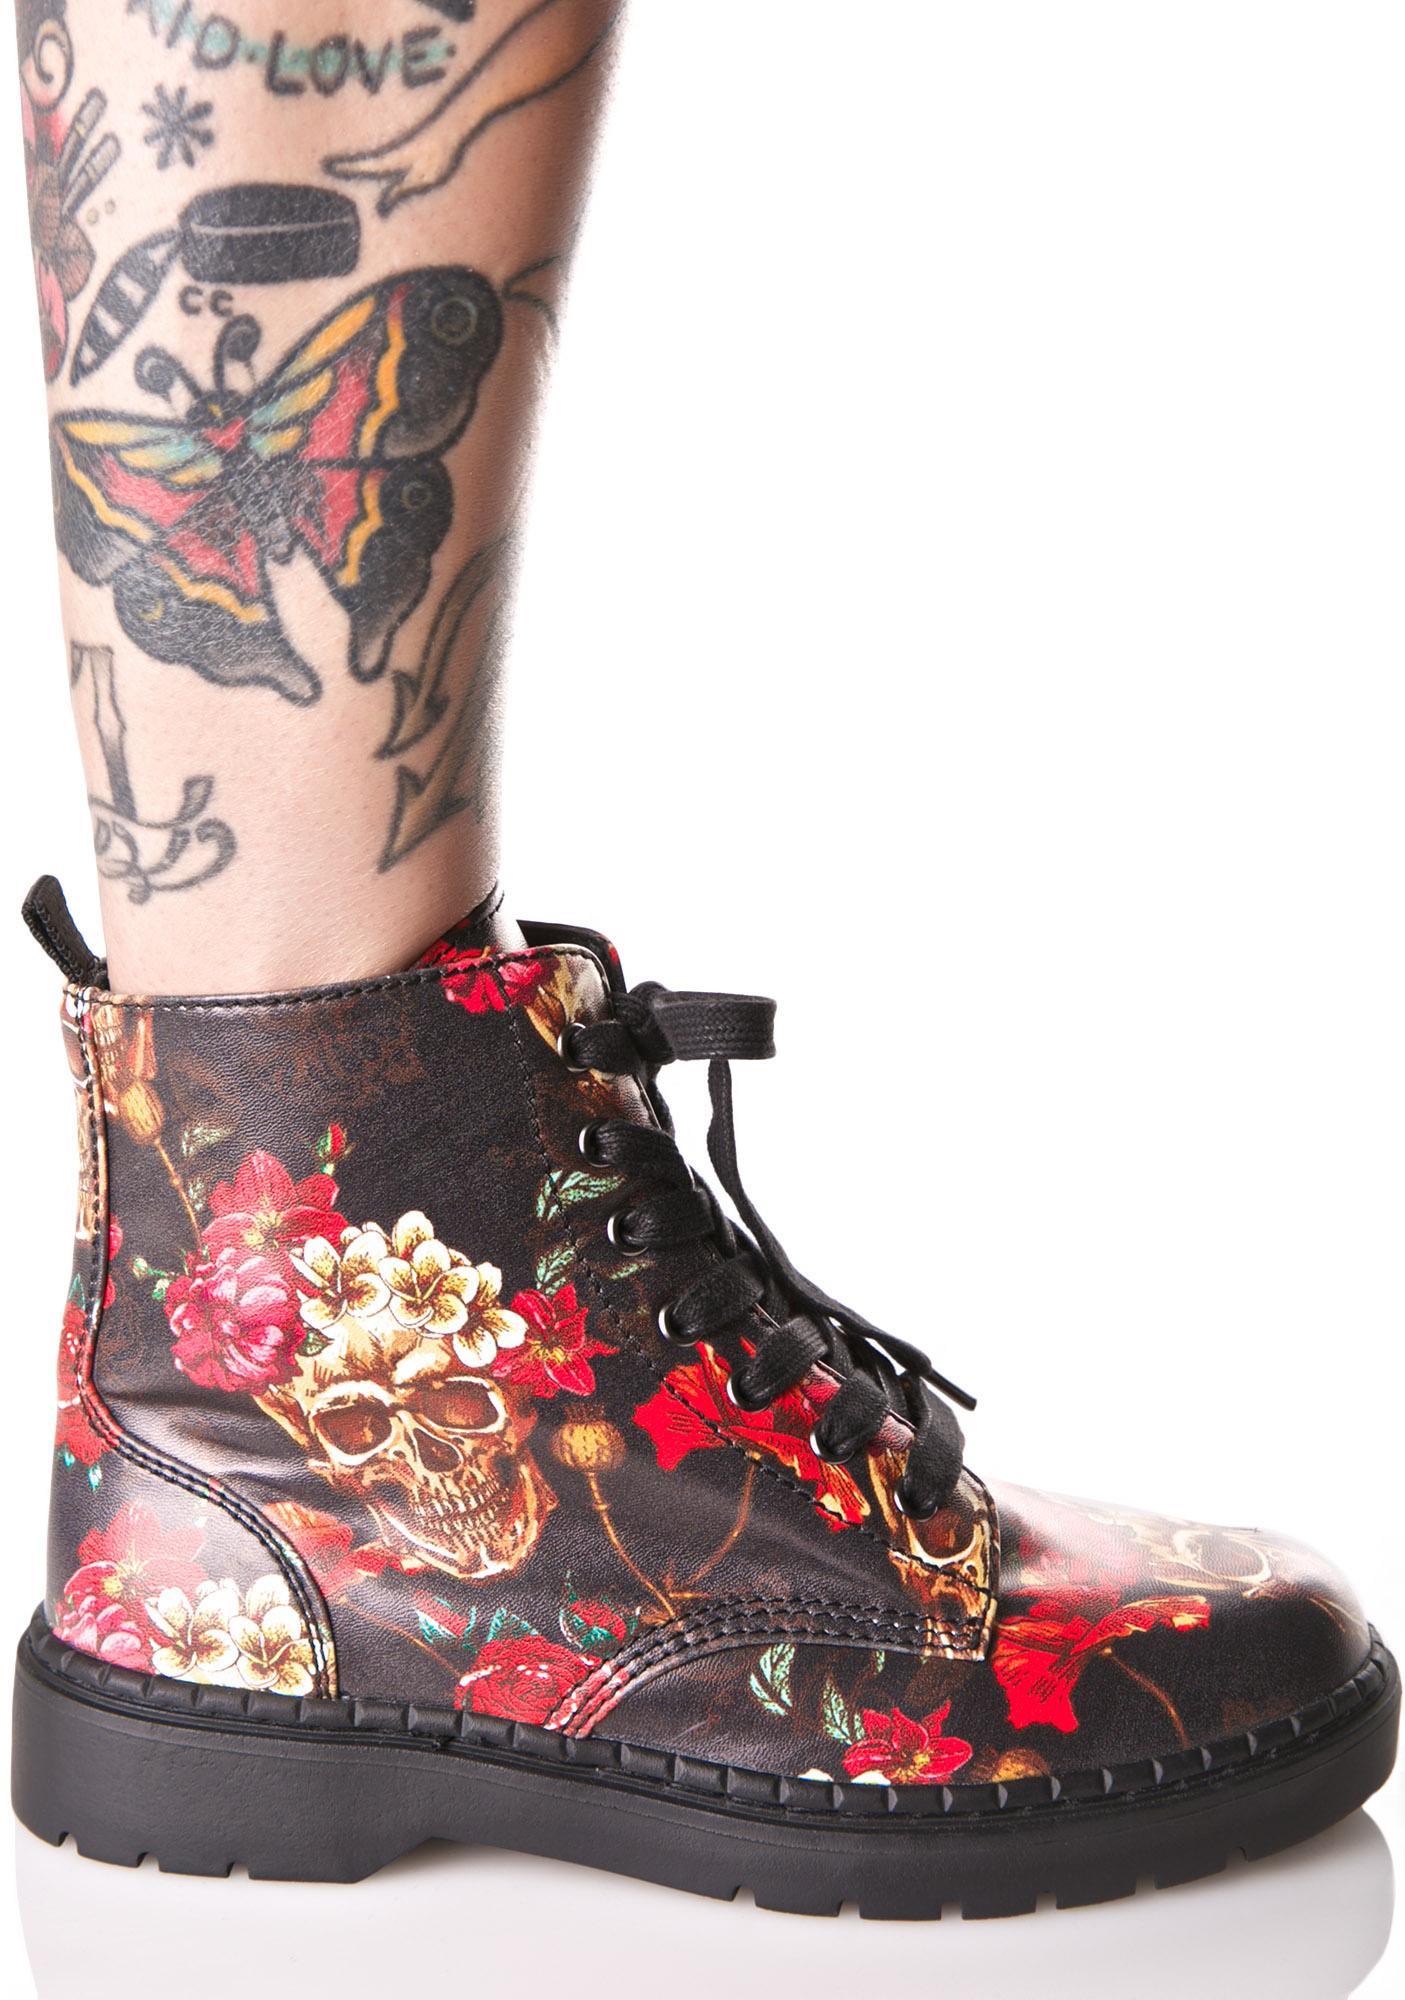 T.U.K. Skull & Roses Ealing Boots